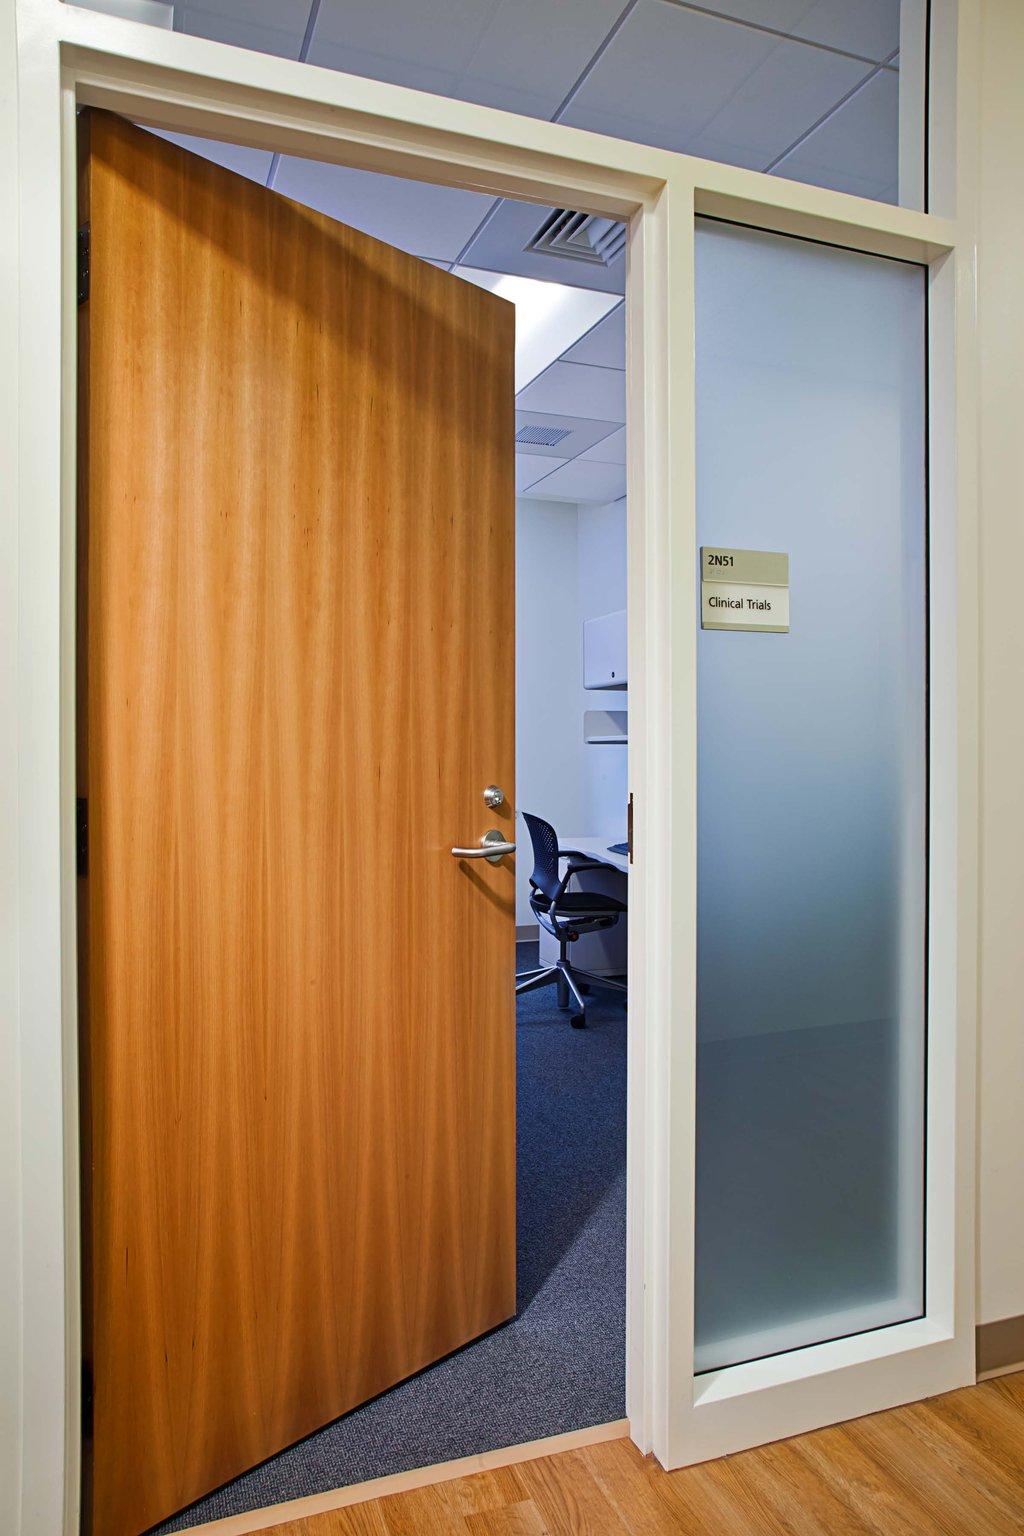 Commercial Wood Doors : Commercial doors and hardware in orlando fl